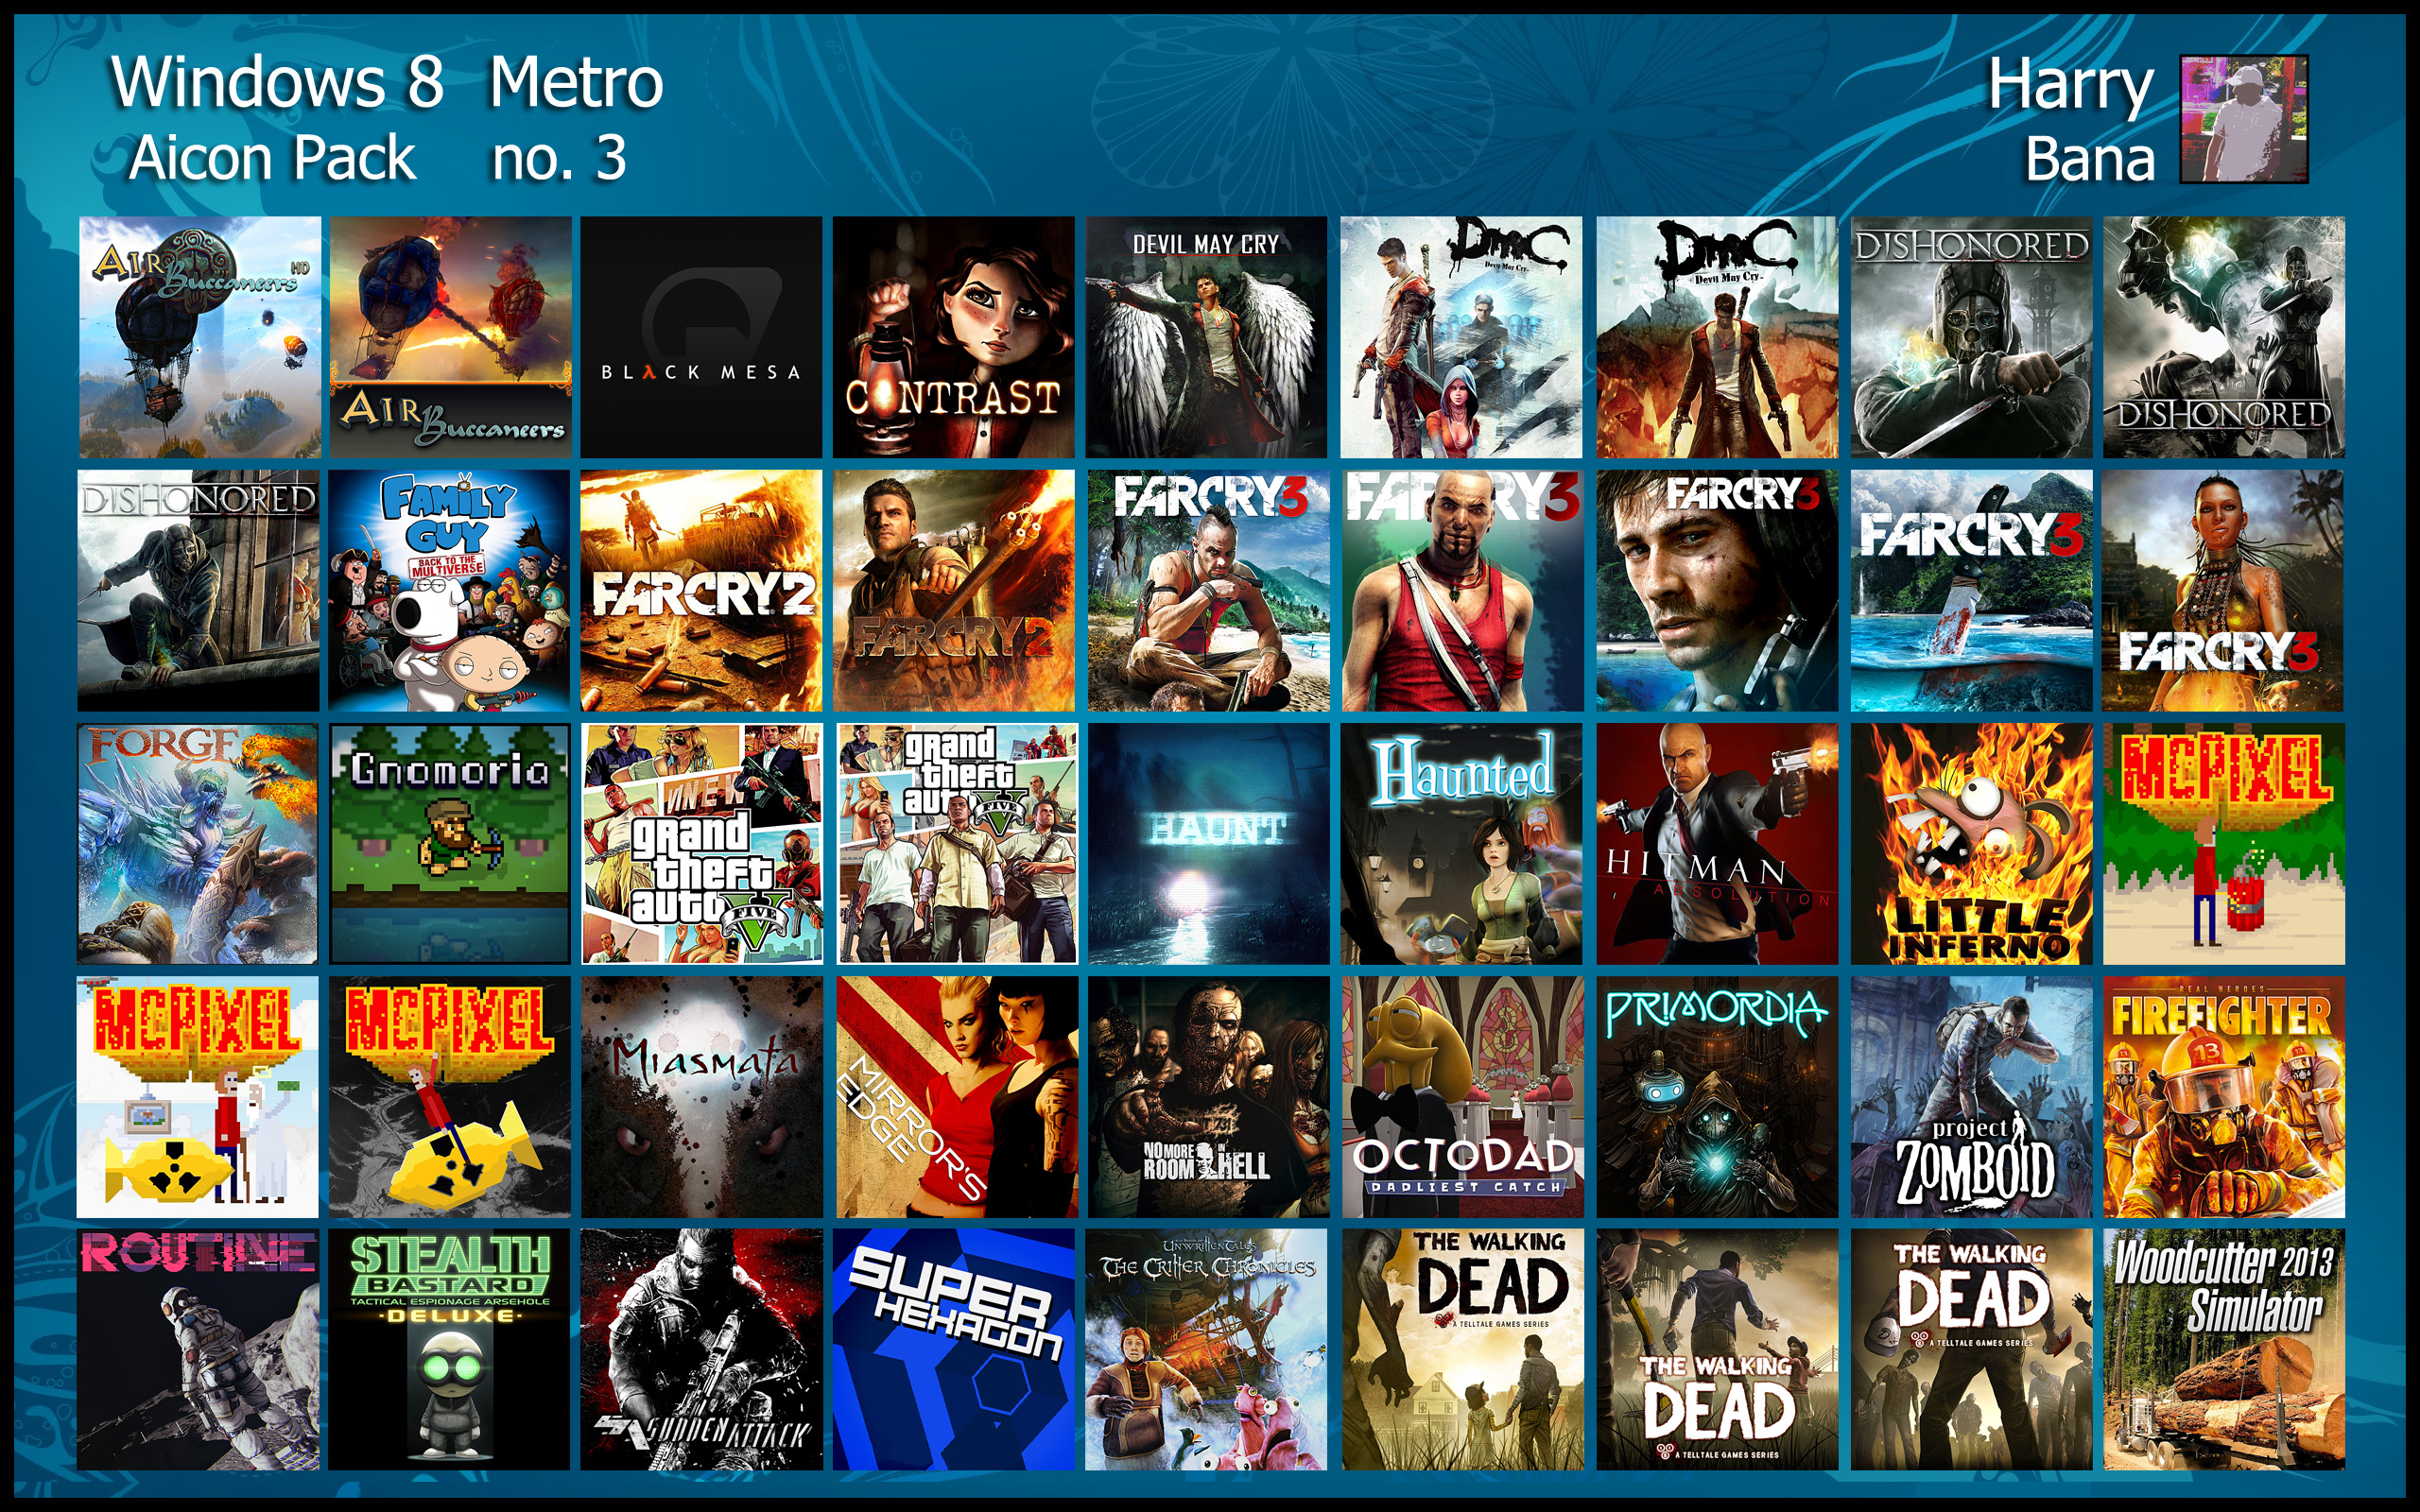 Windows 8 Metro Aicon Pack 3 by HarryBana